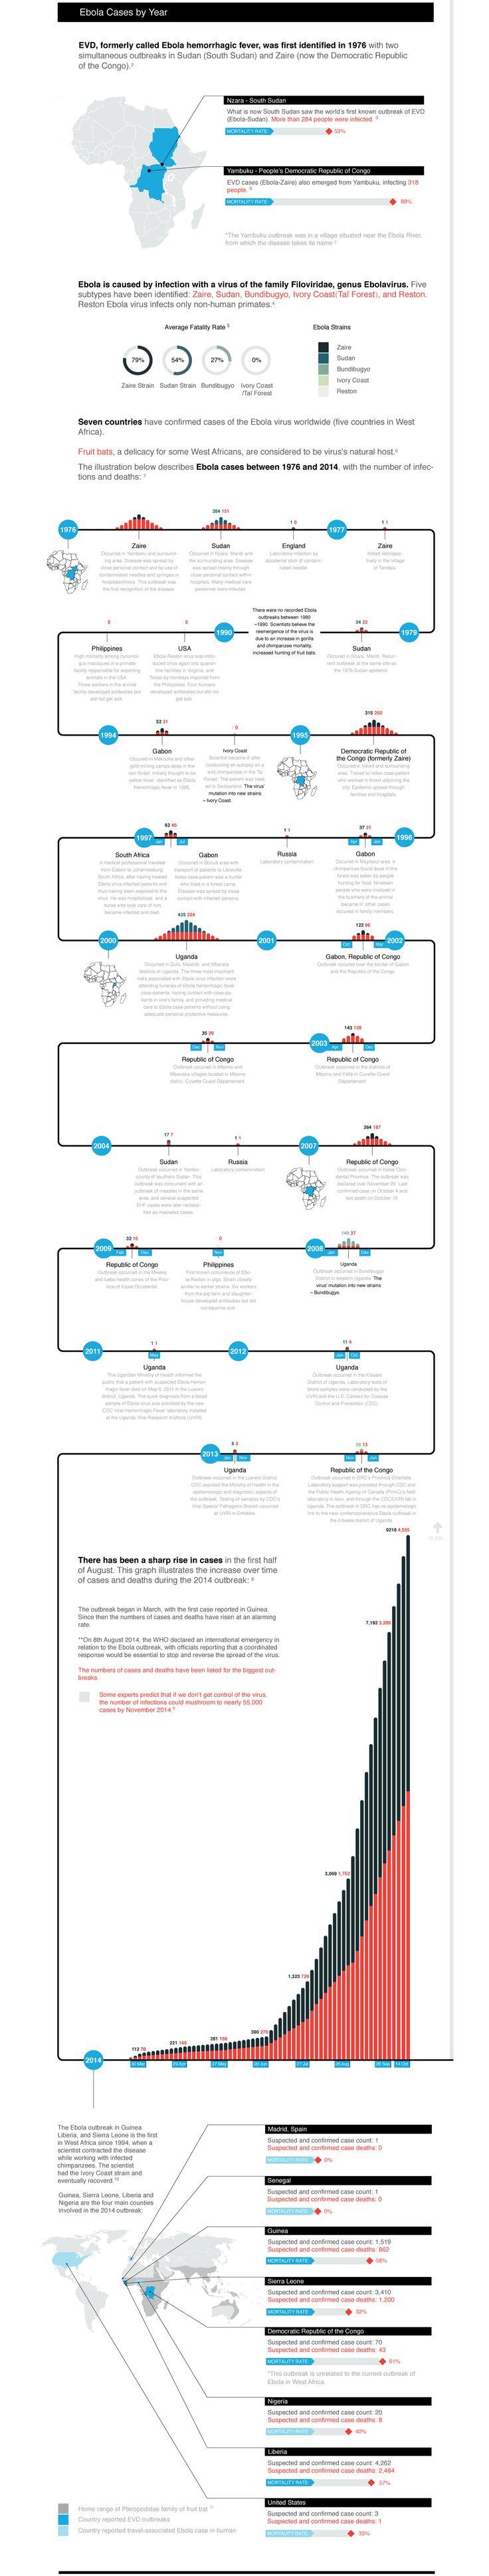 Understanding Ebola: A Visual Guide